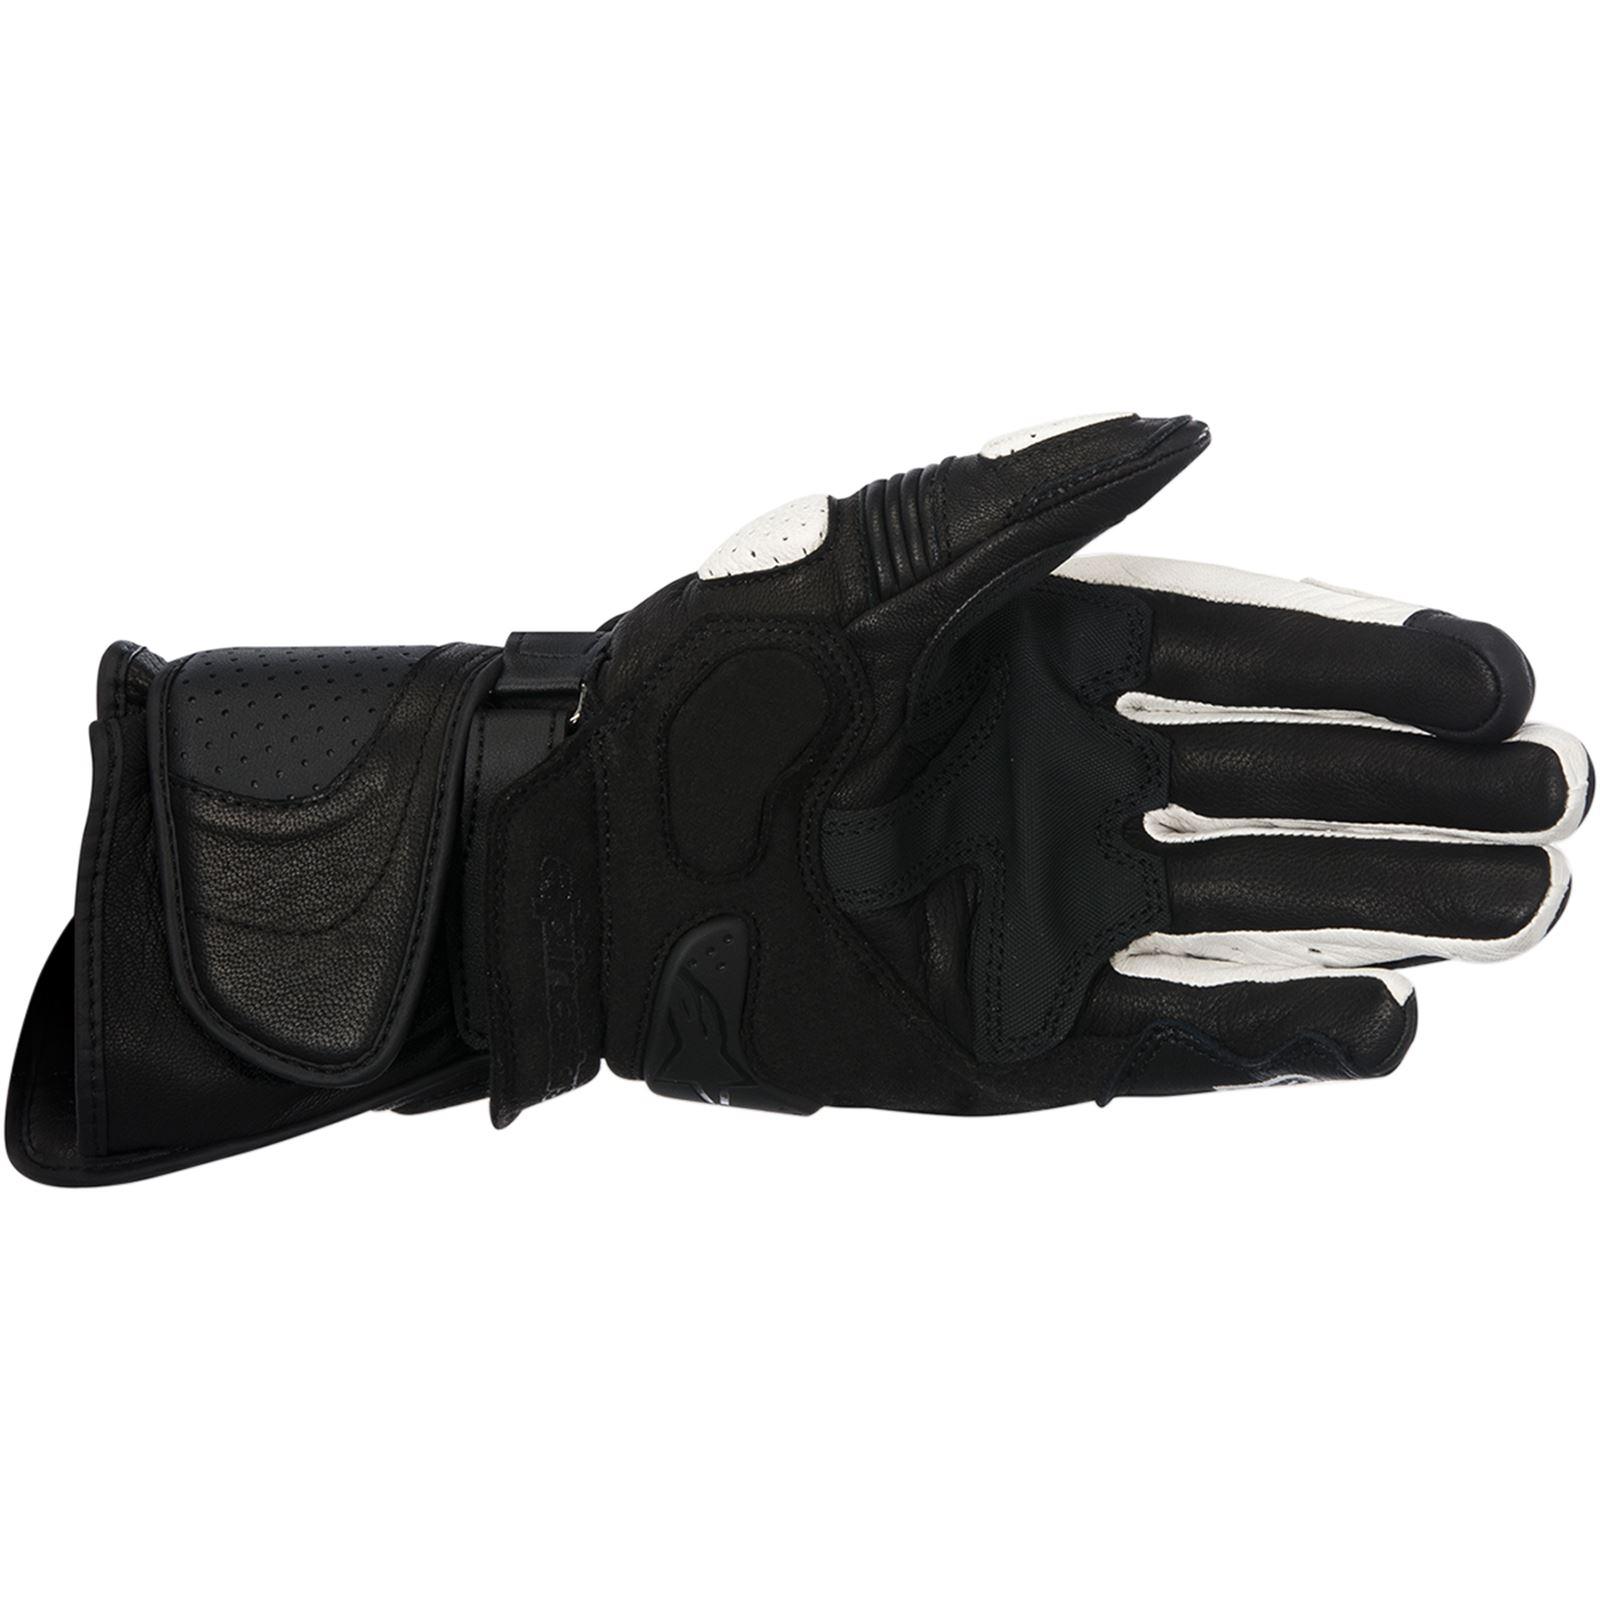 Alpinestars Women's Stella SP-1 Gloves - Black/White - X-Small